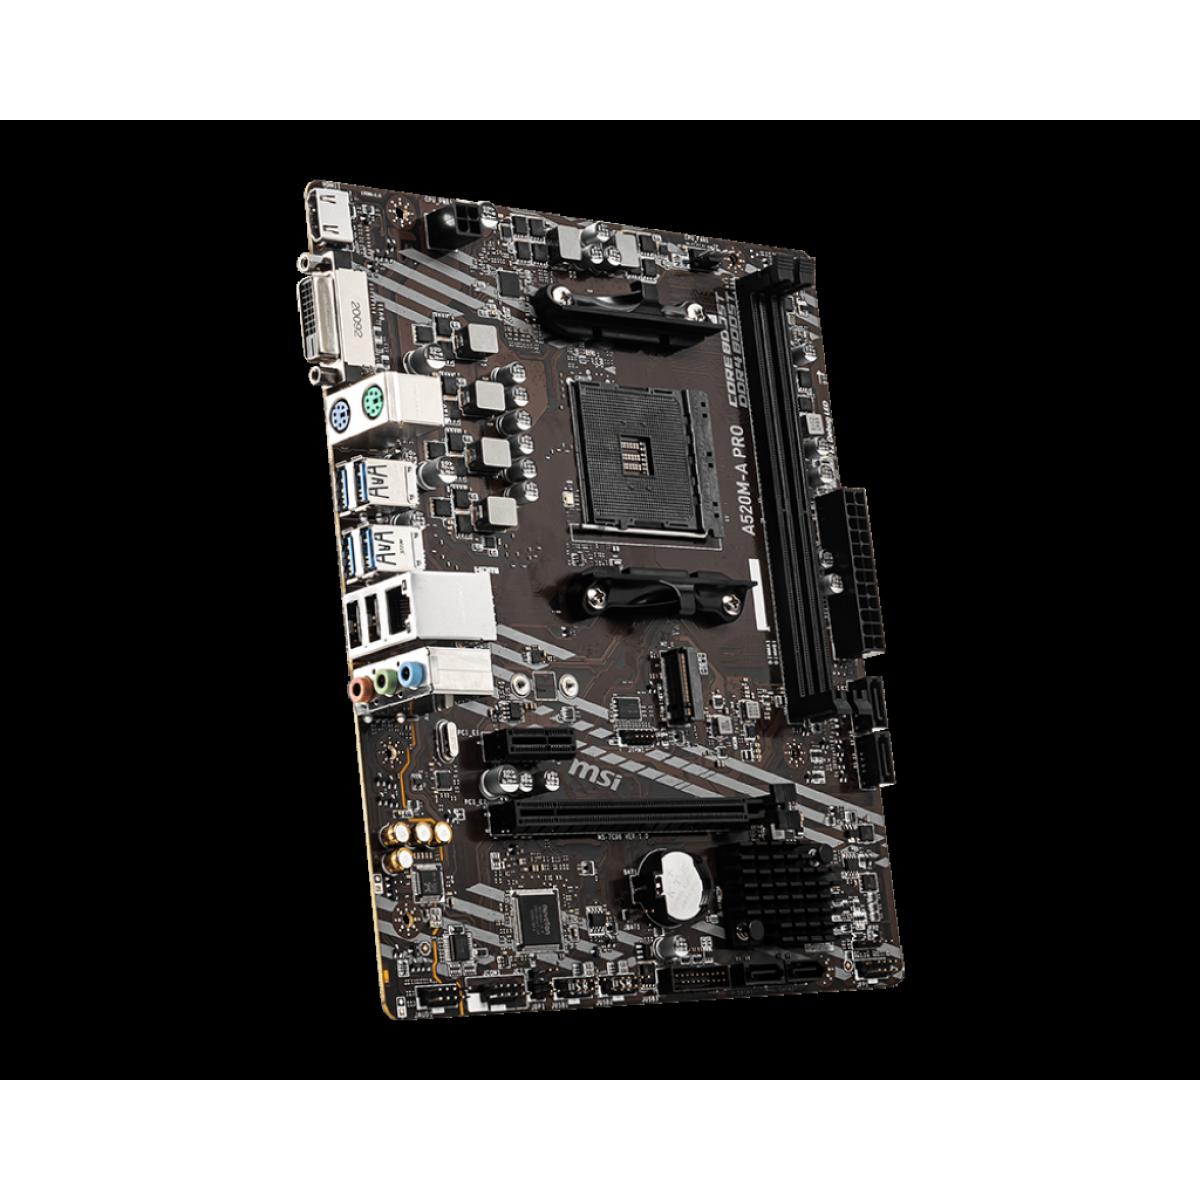 Placa Mãe MSI A520M-A PRO. Chipset A520, AMD AM4, mATX, DDR4, 911-7C96-002